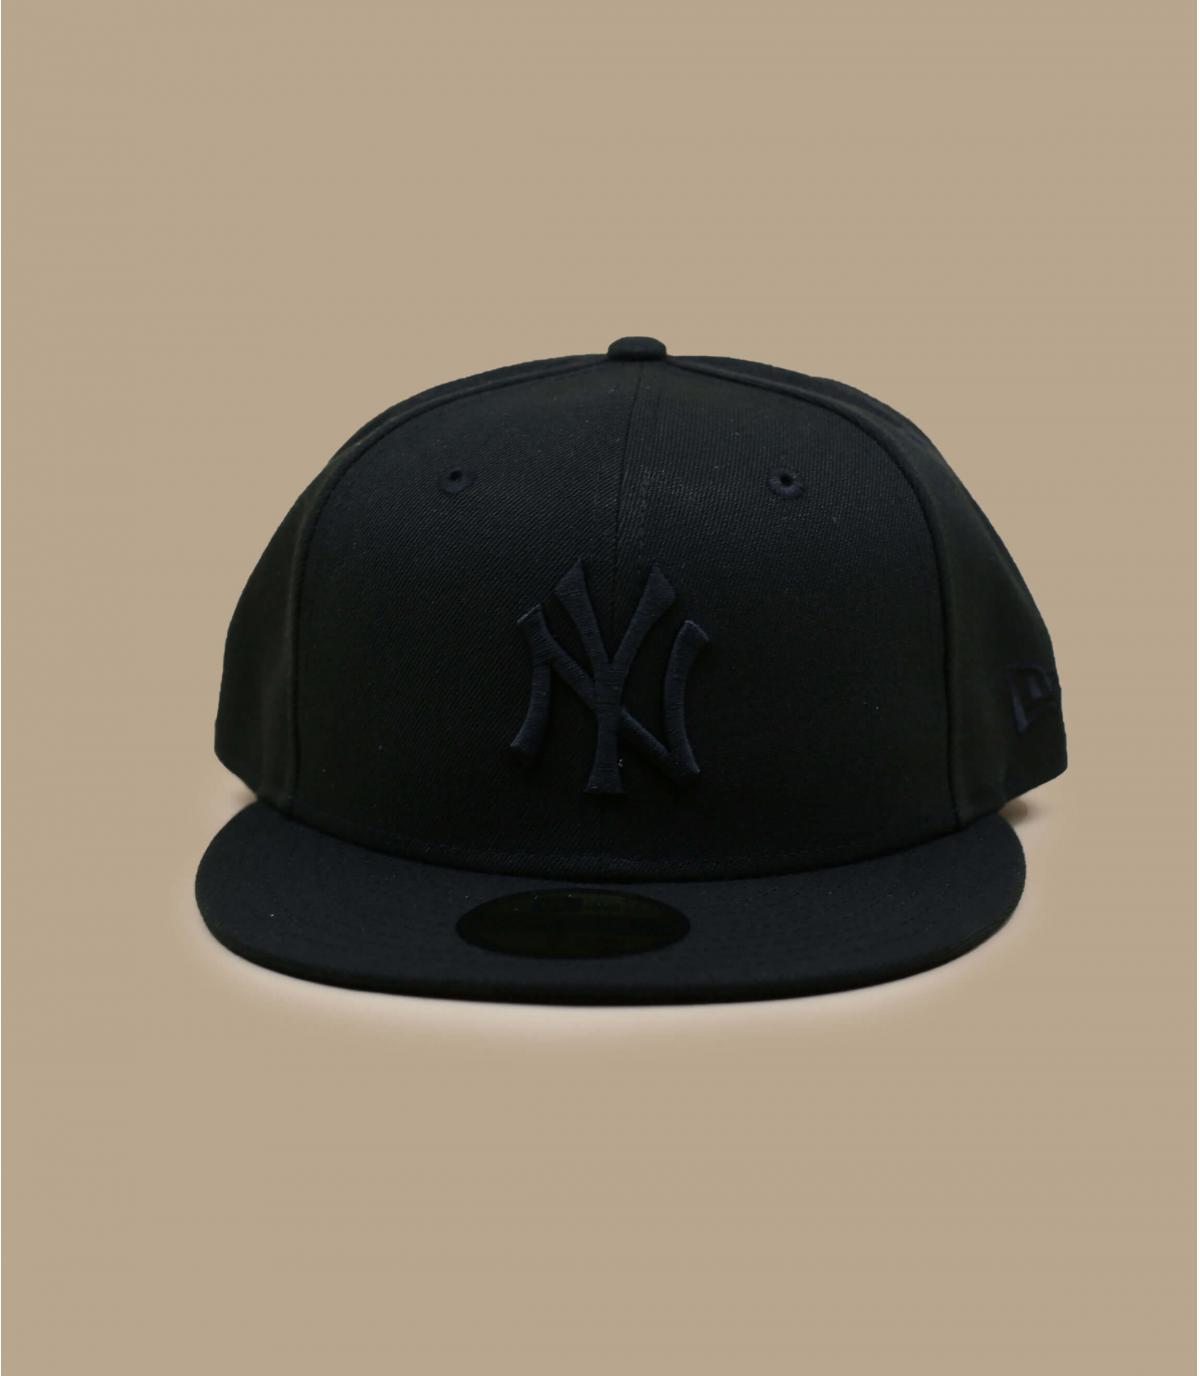 Details MLB Basic NY 59Fifty black black - Abbildung 2